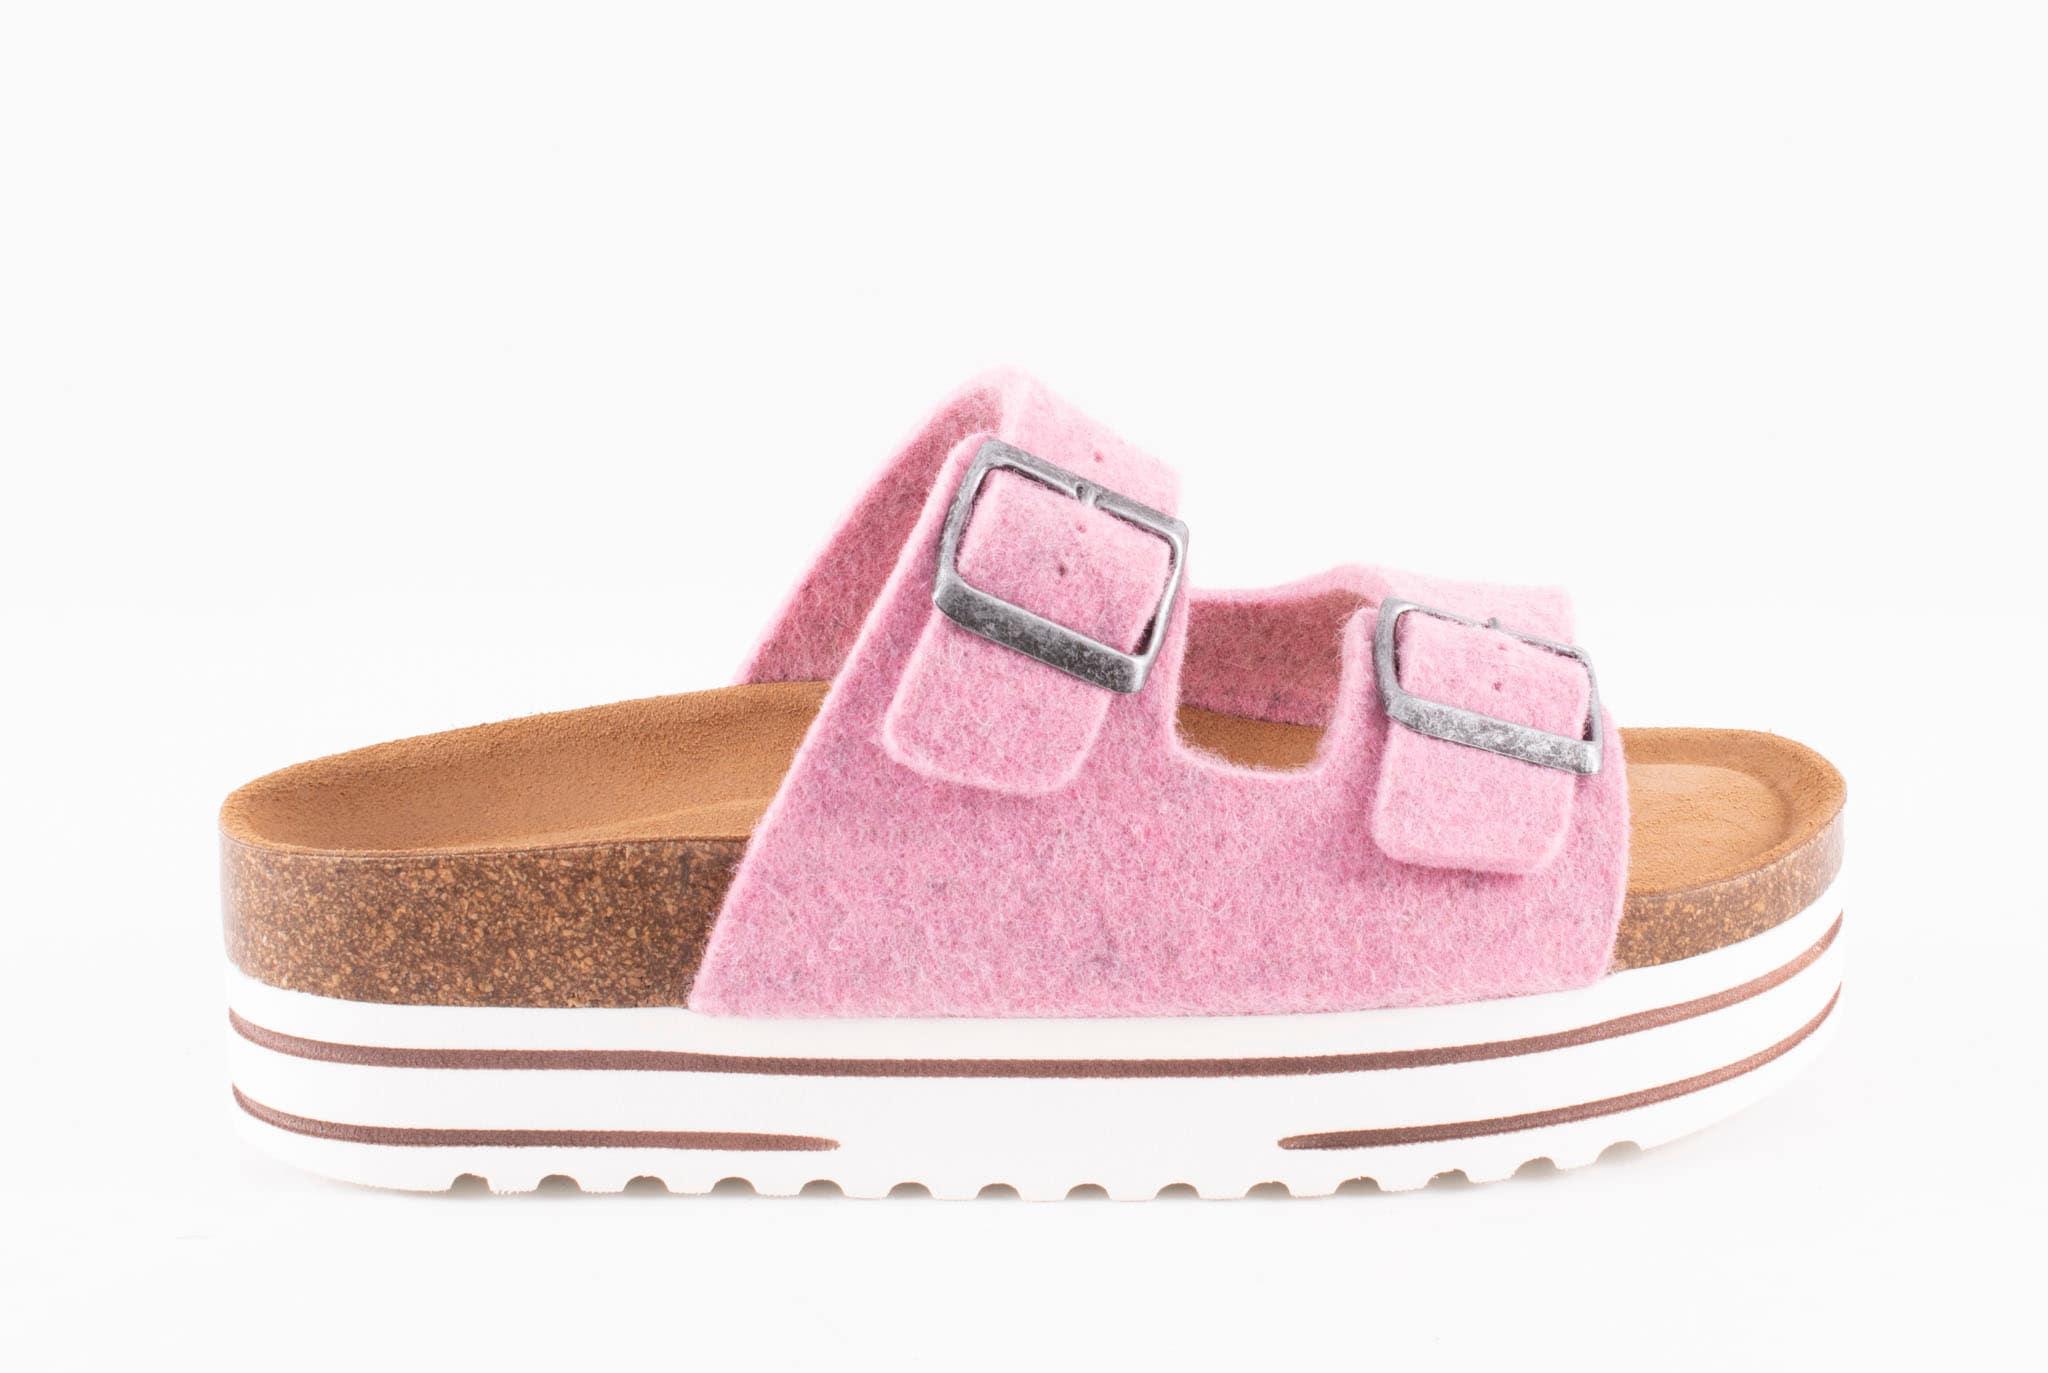 Shepherd Kattis sandals